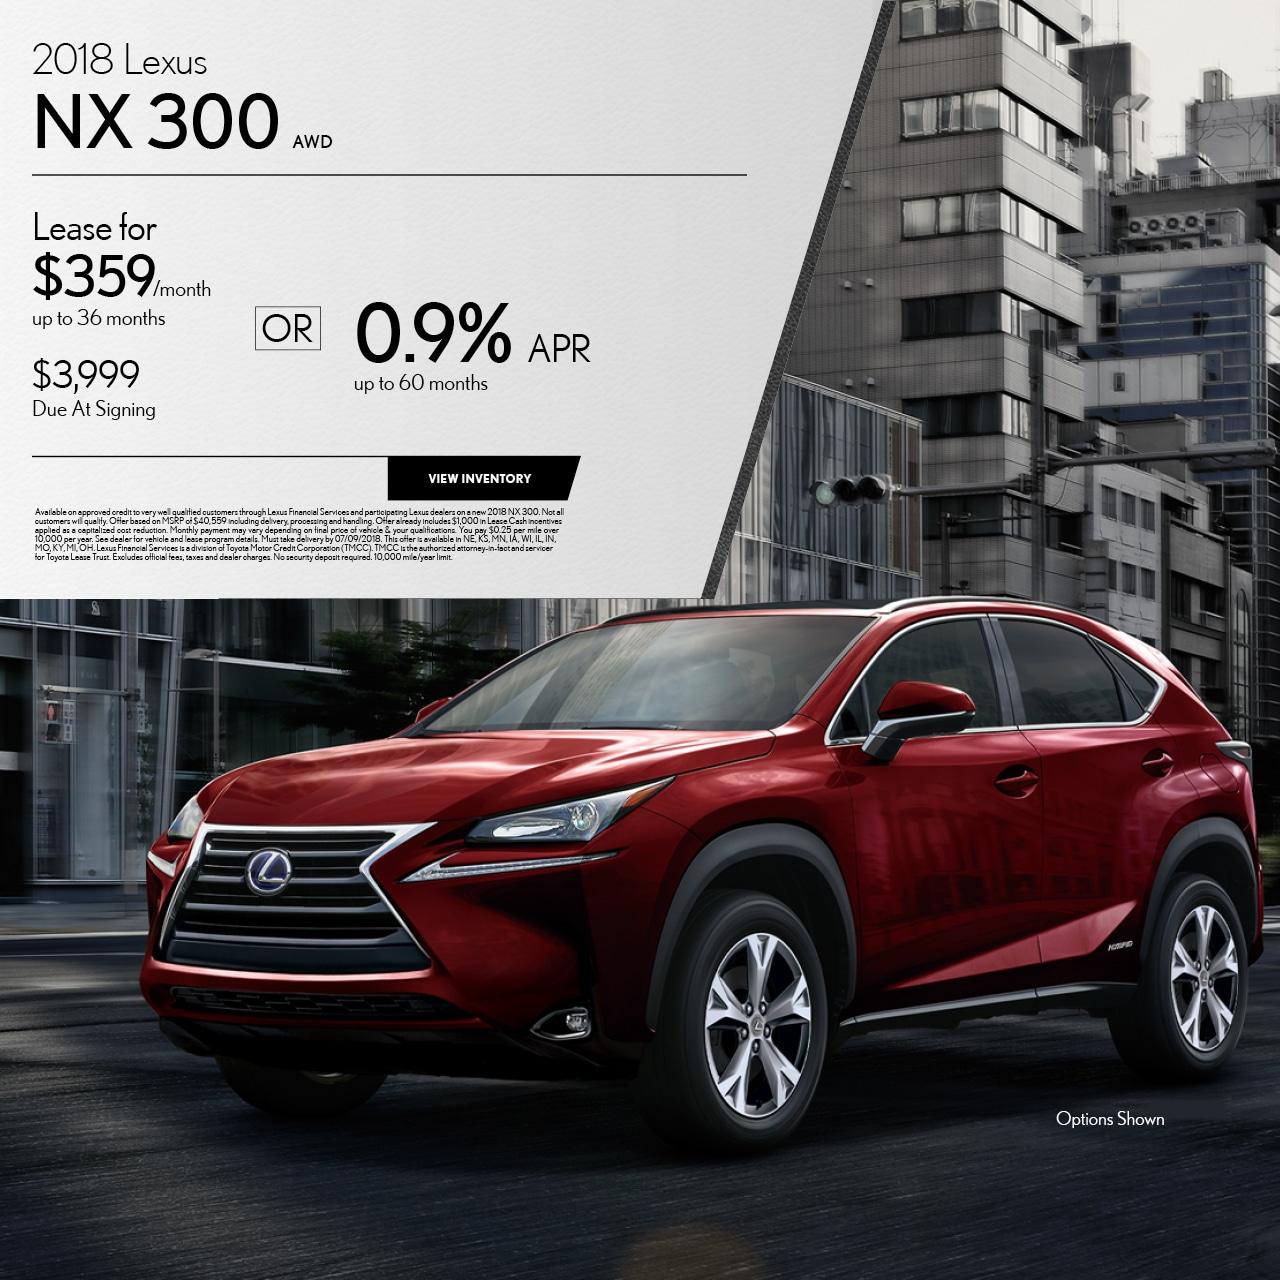 Lx 350 Lexus: New Lexus Dealership In Mishawaka, IN